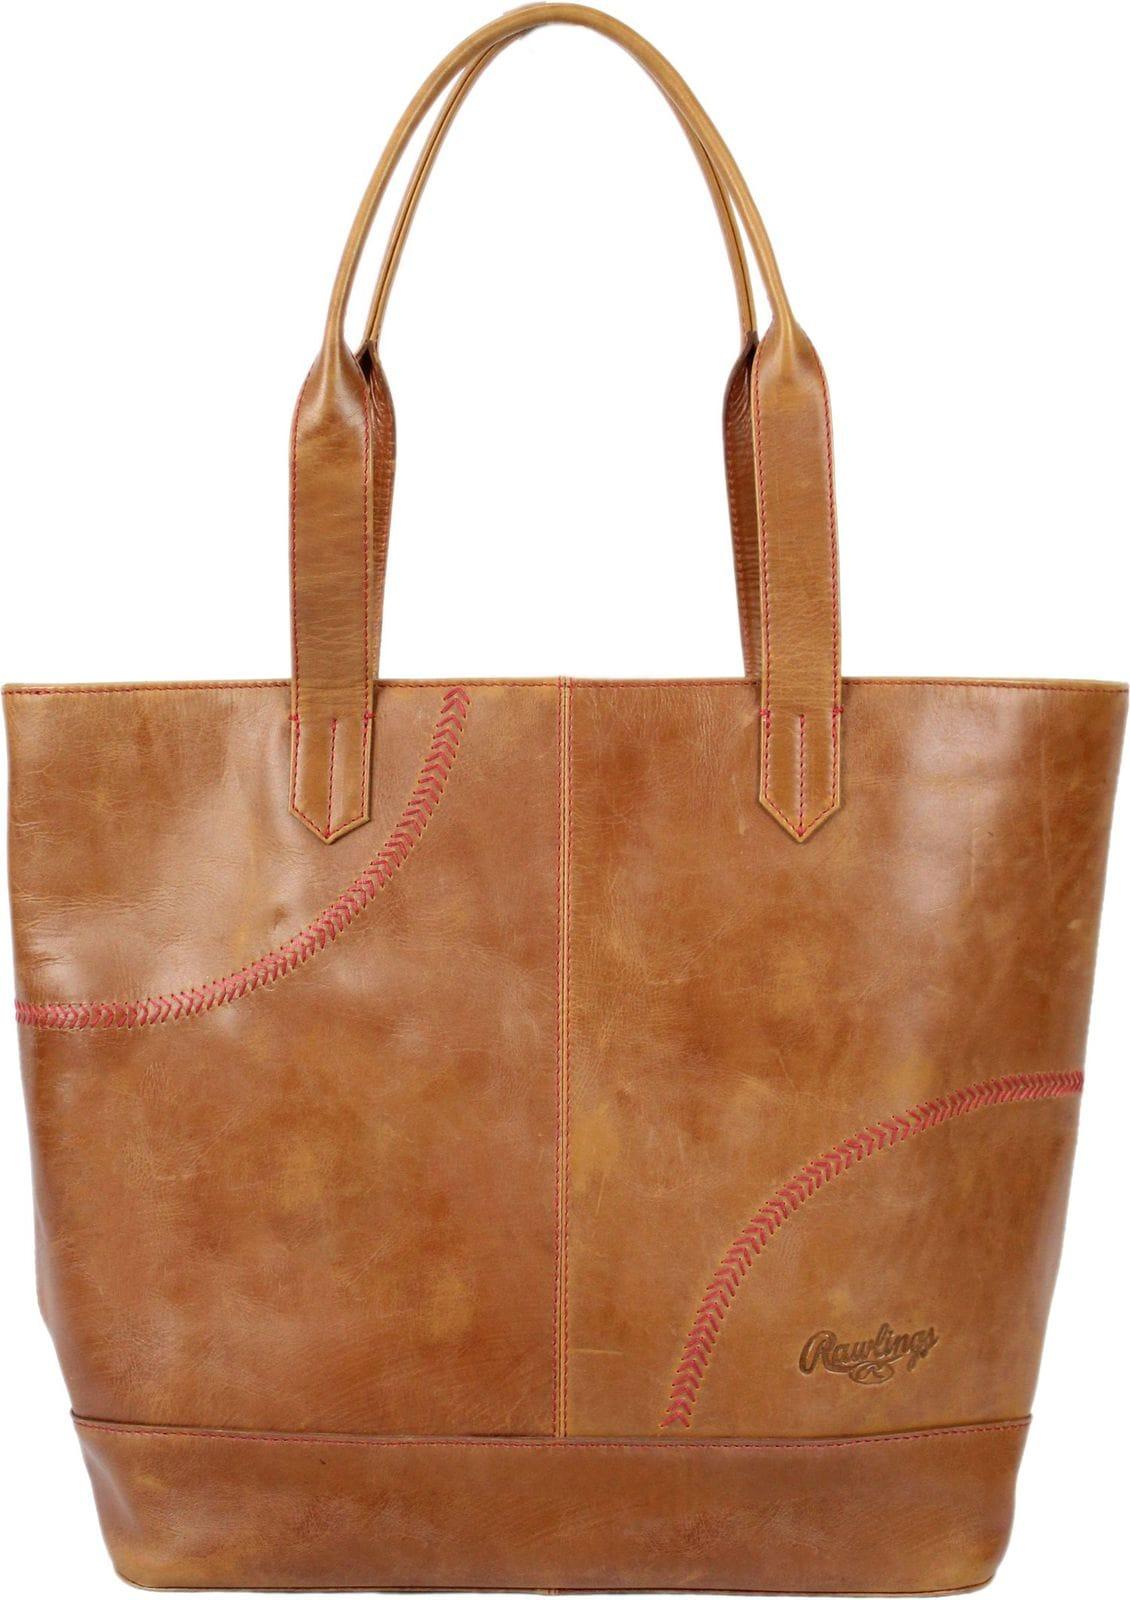 Rawlings leather tote bag